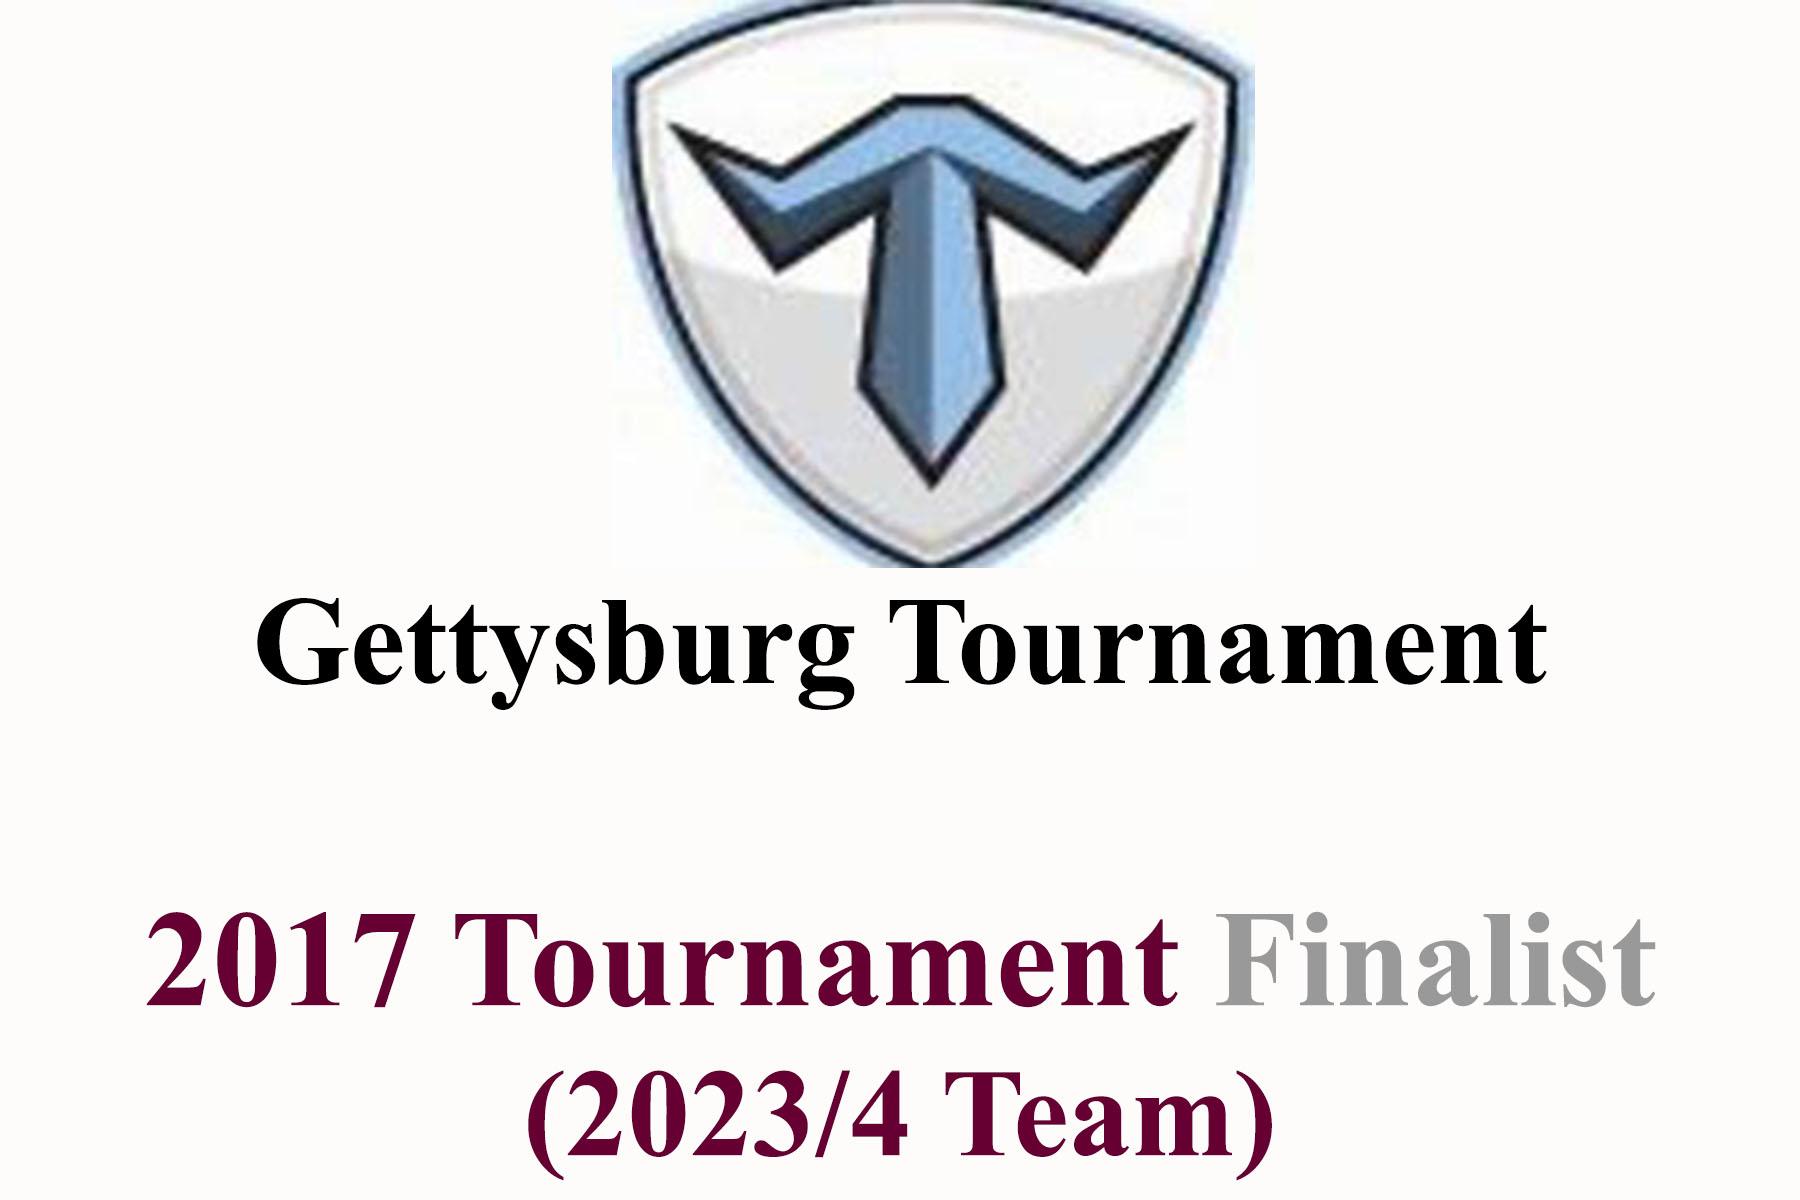 gettysburg 2023